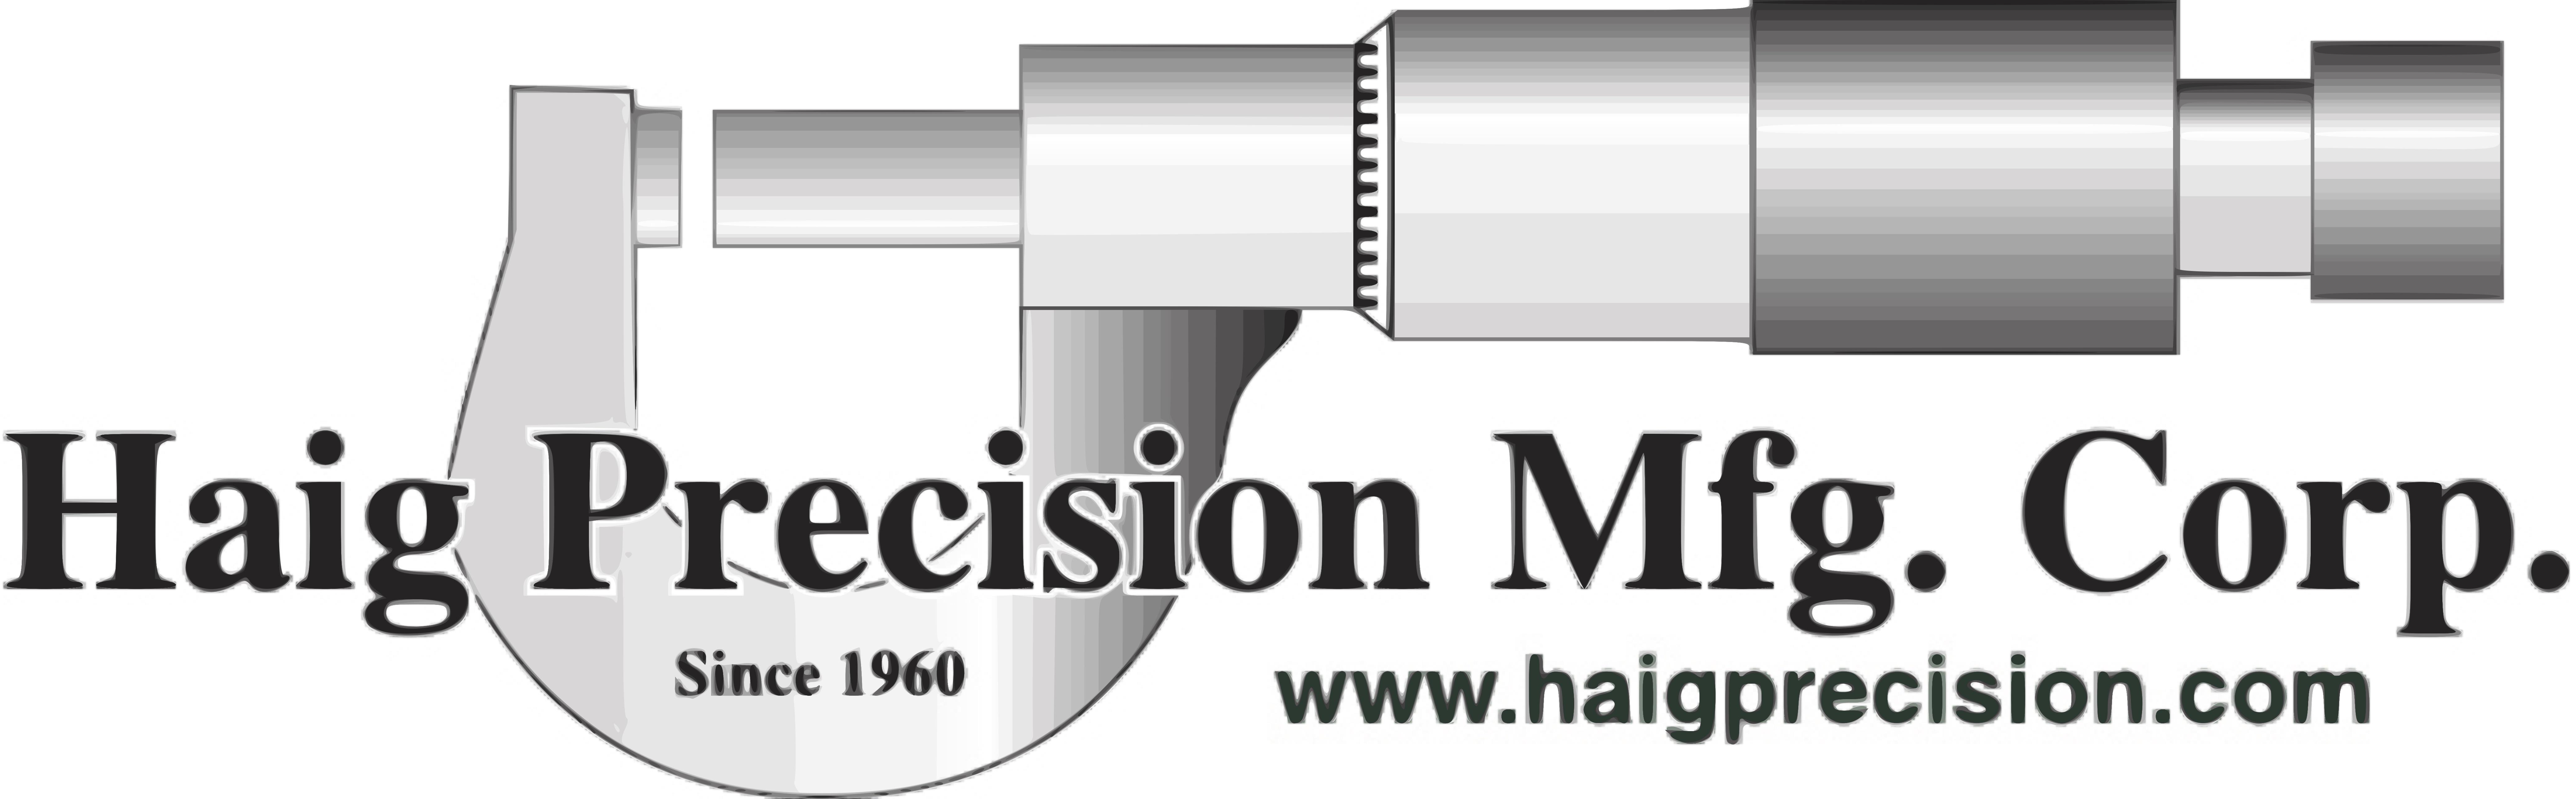 Haig Precision logo